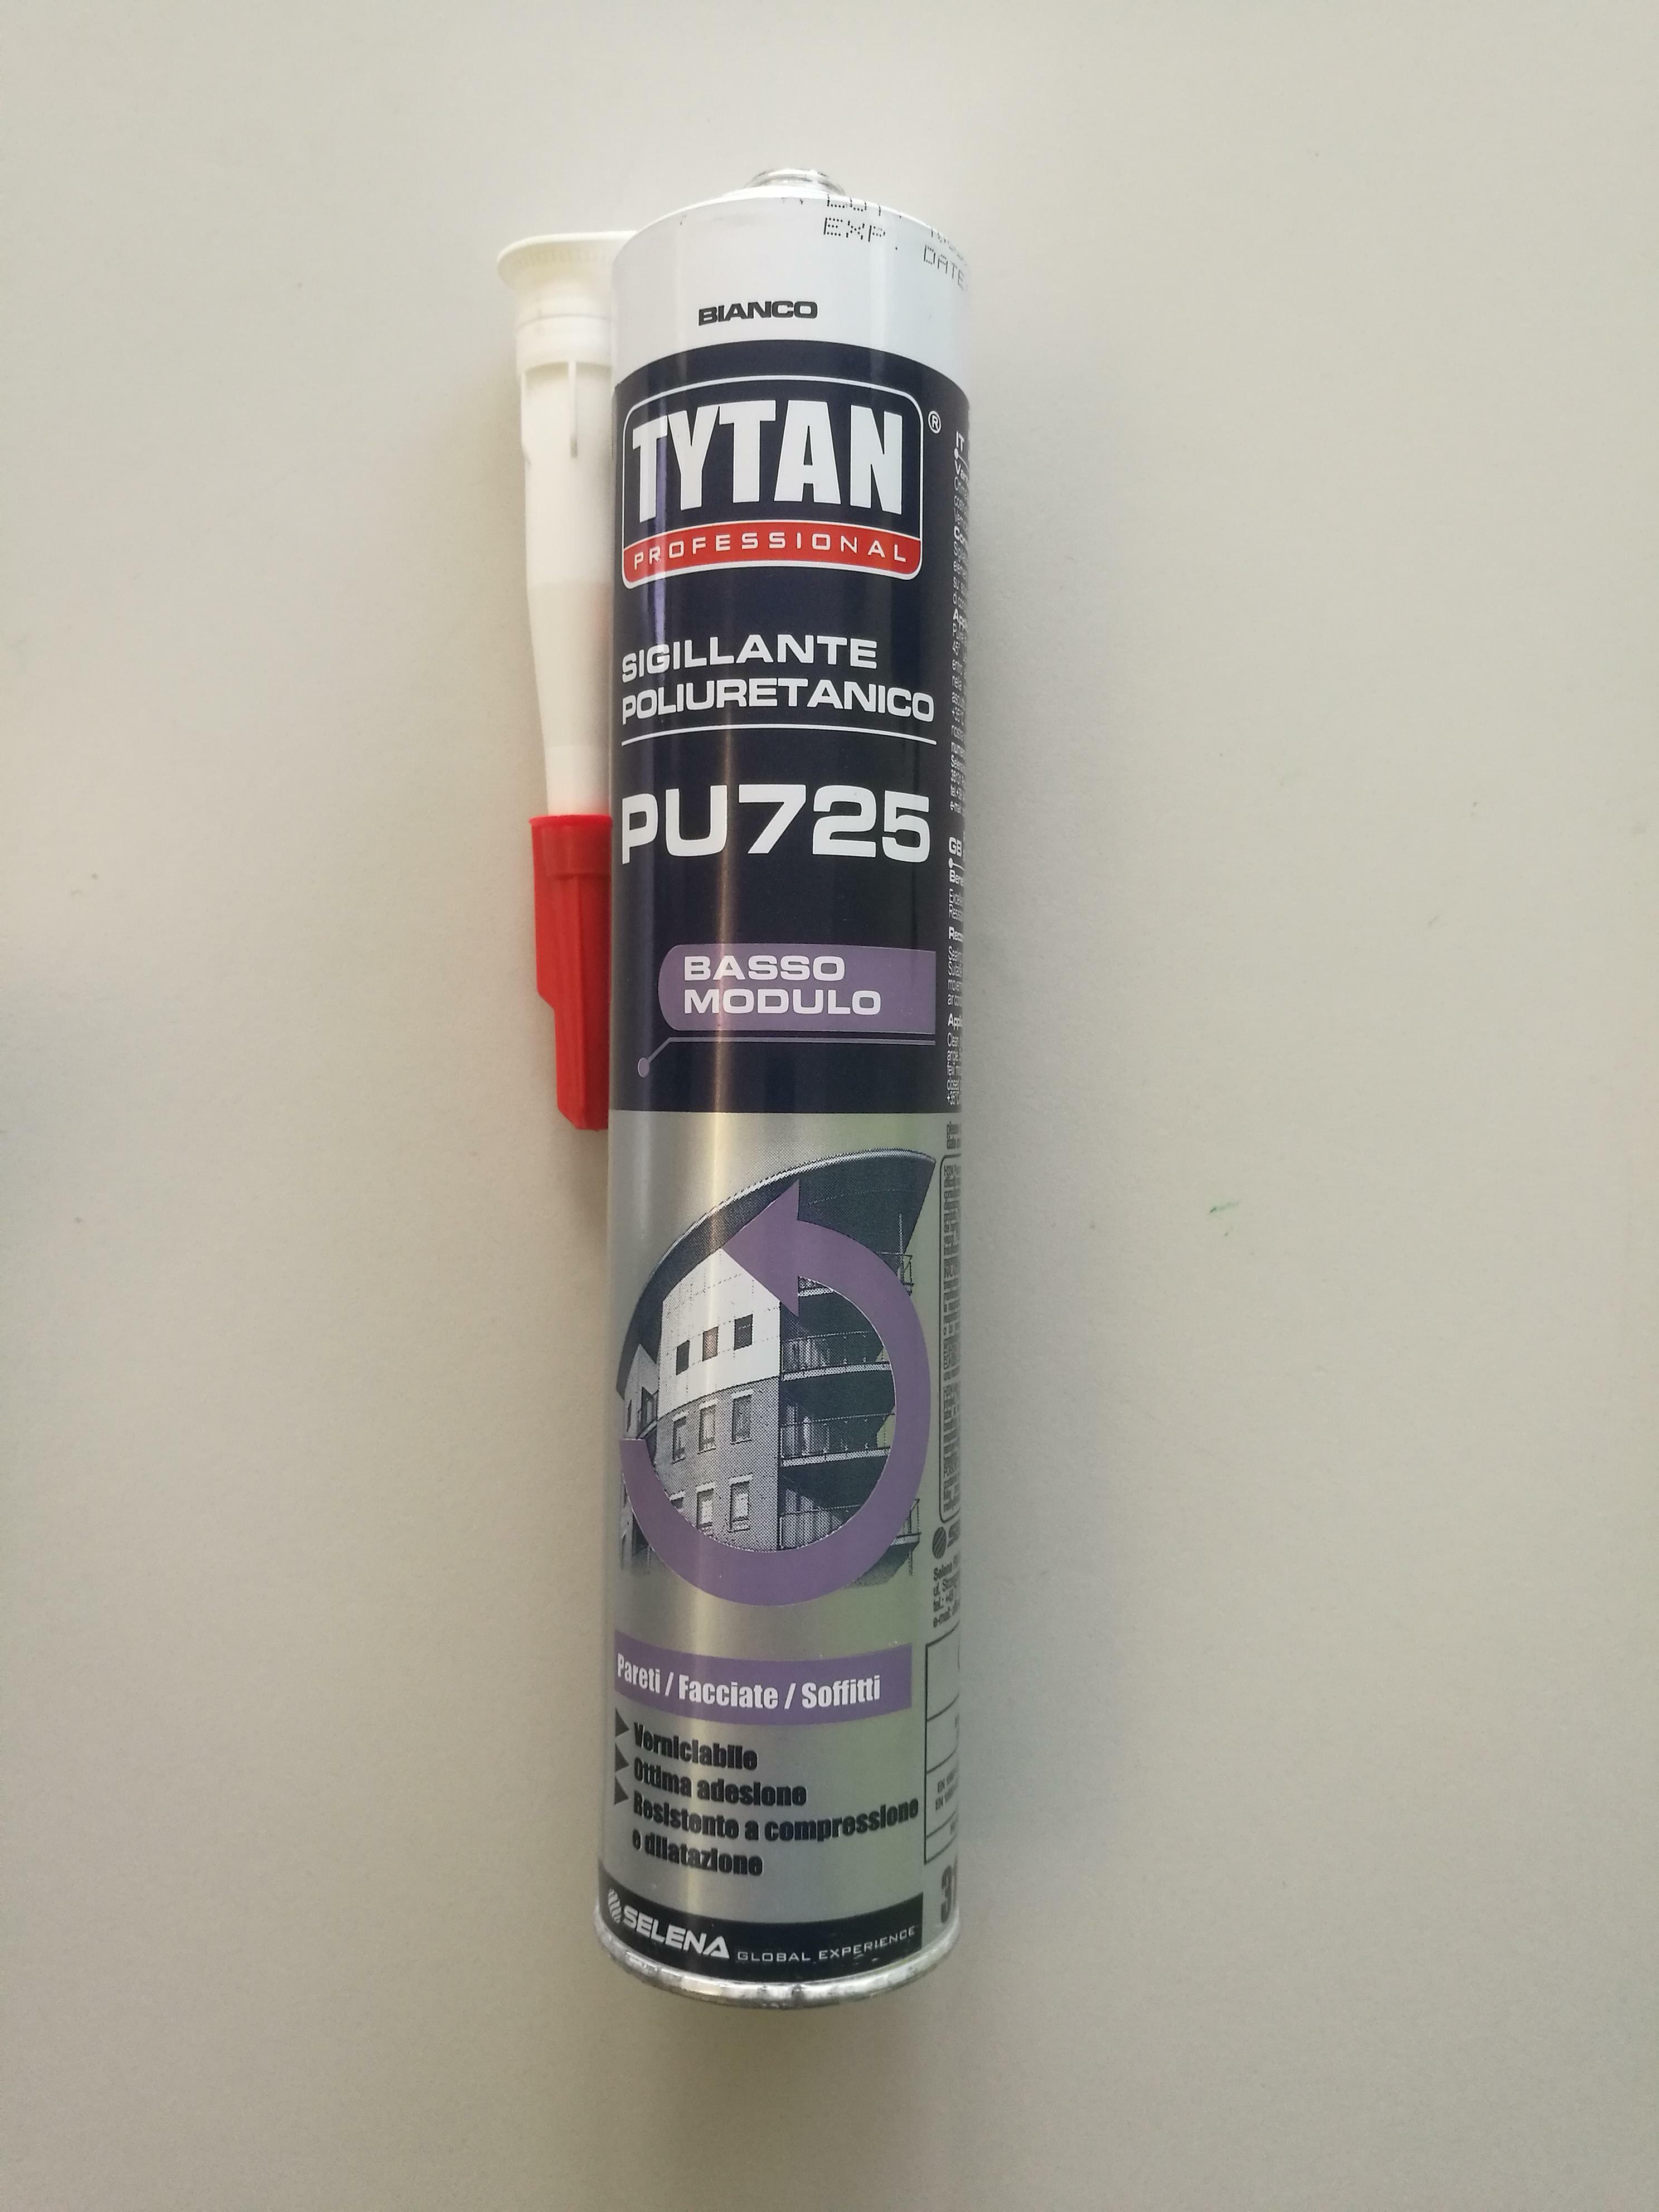 tytan professional tytan professional sigillante poliuretanico basso modulo pu725 bianco 310ml